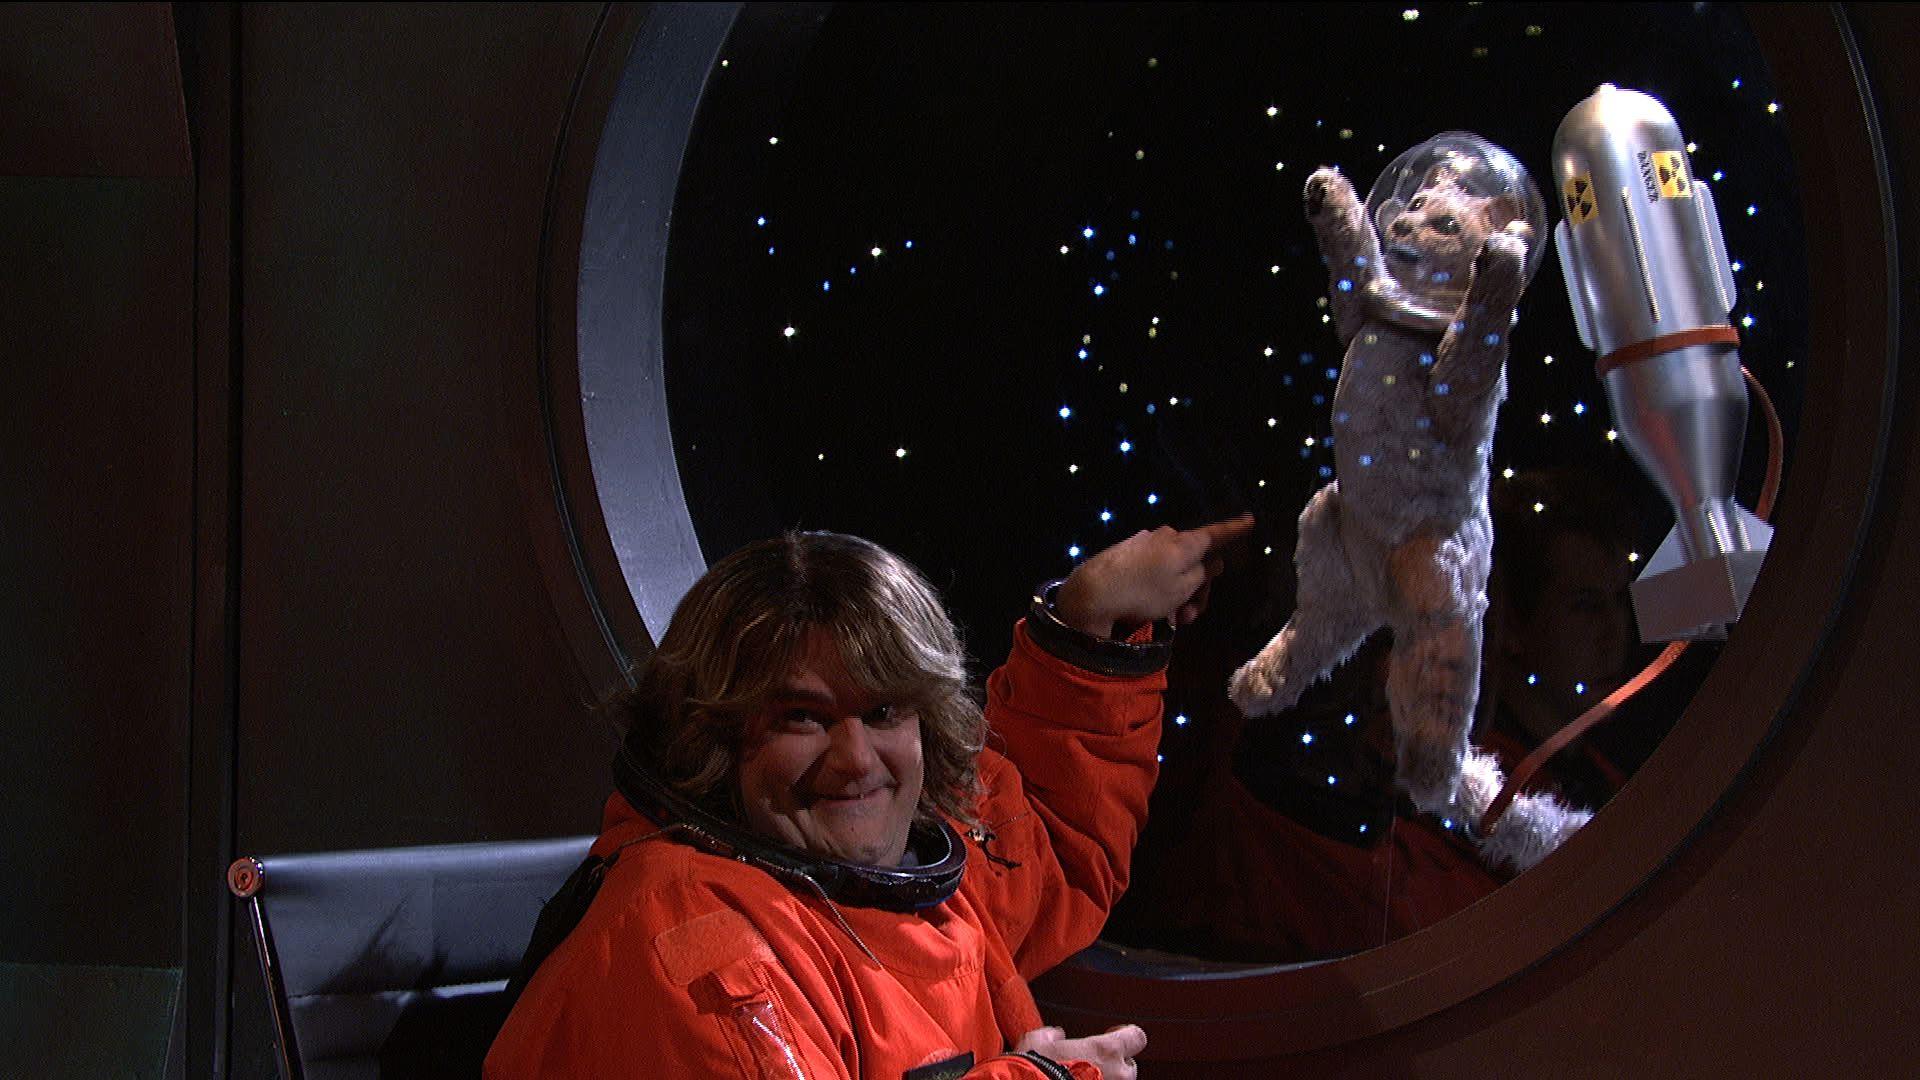 Watch Saturday Night Live Highlight: Armageddon